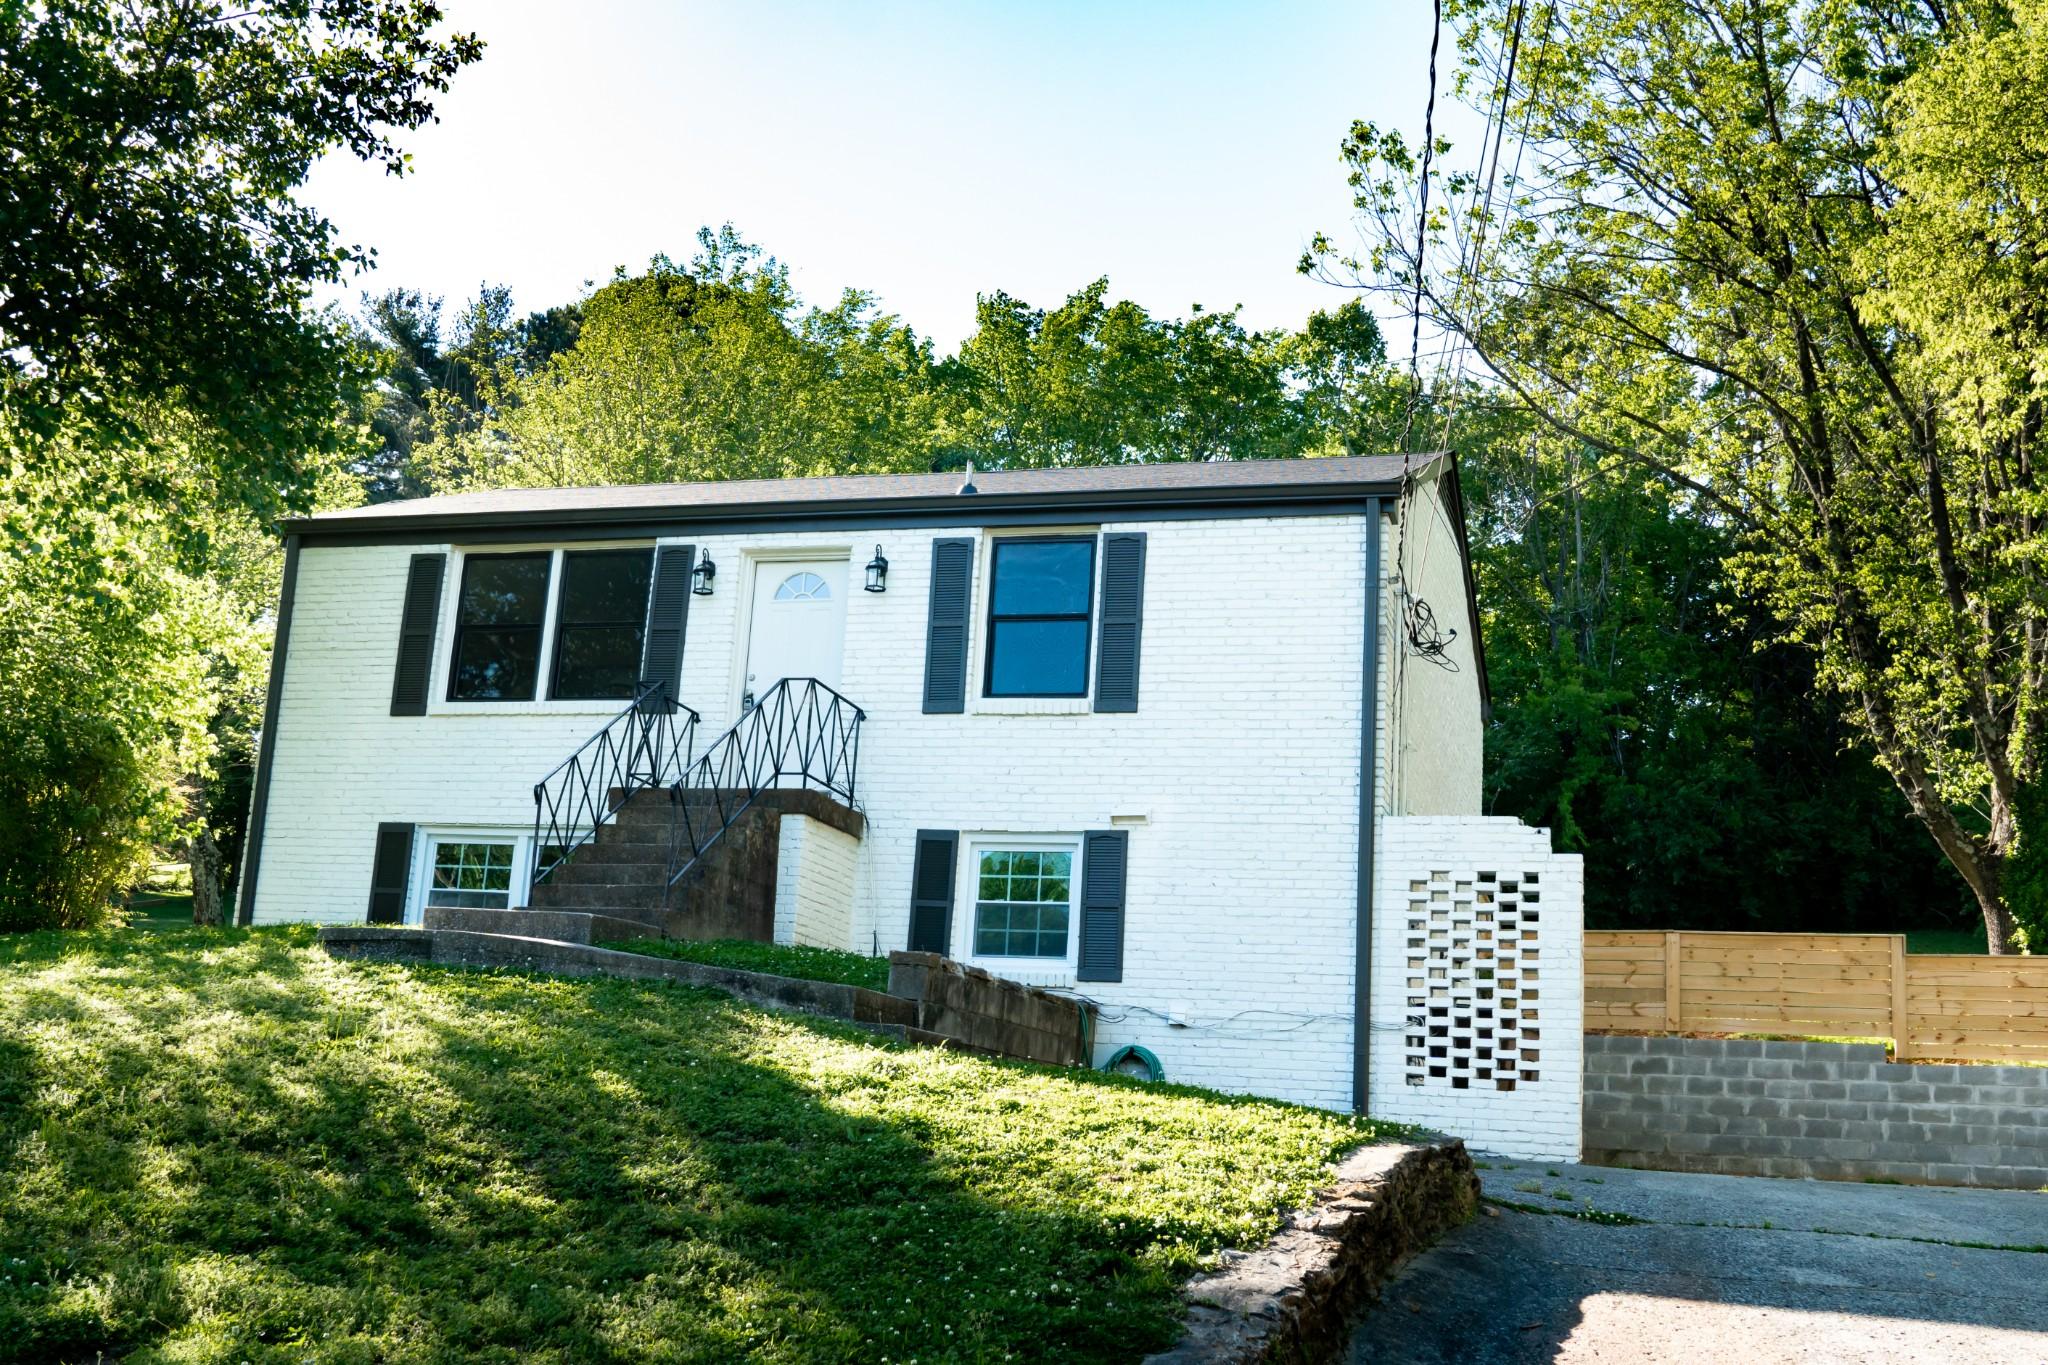 330 Elysian Fields Rd, Nashville, TN 37211 - Nashville, TN real estate listing